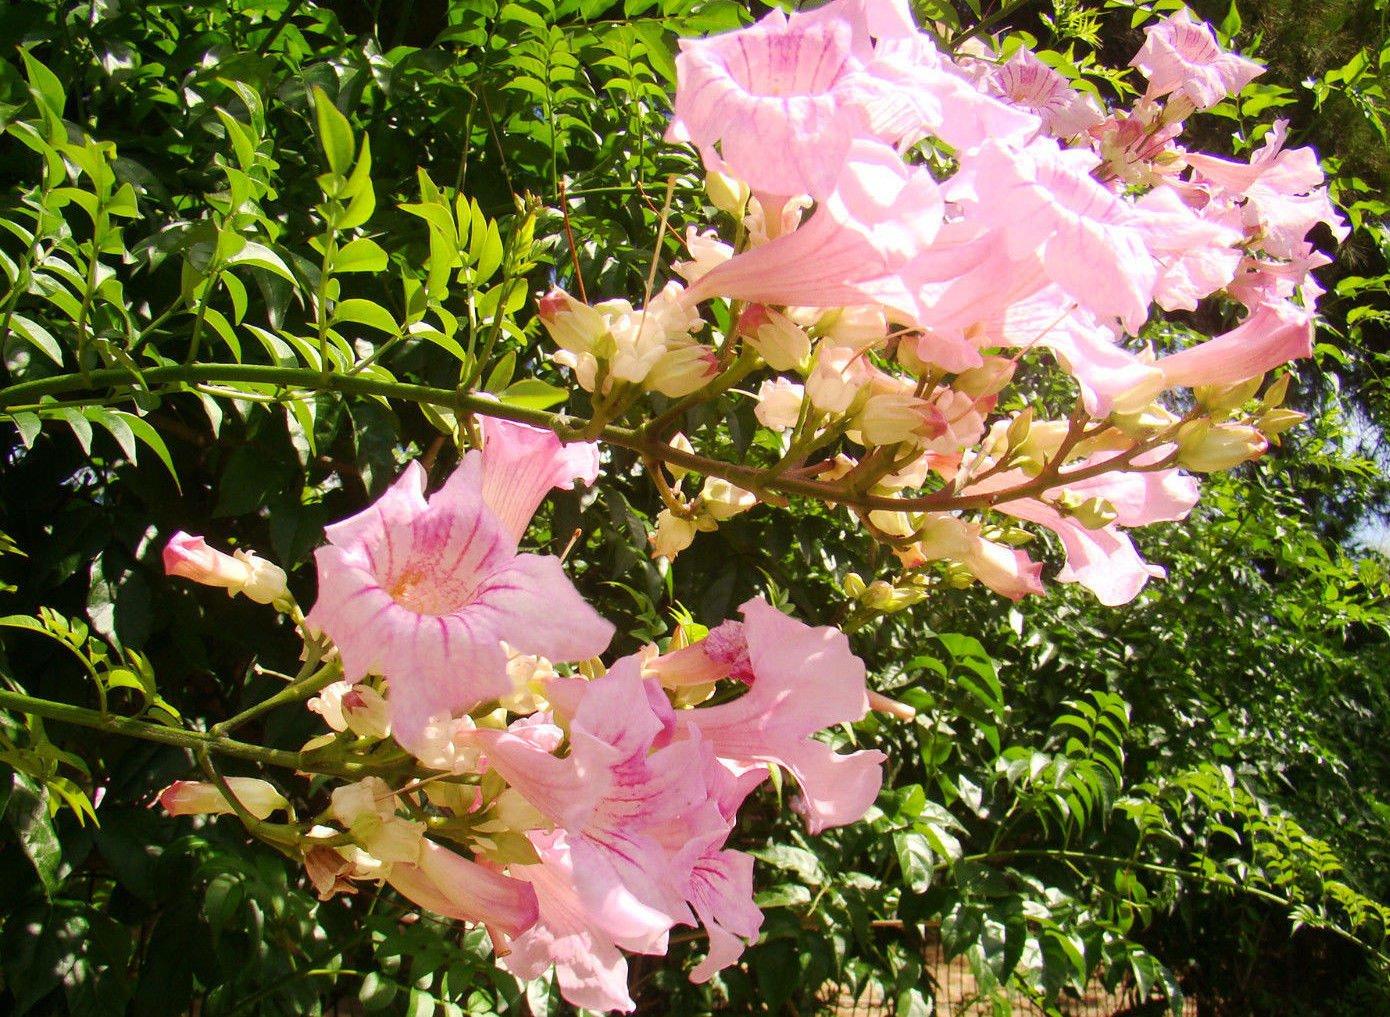 Queen of sheba or pink trumpet vine podraena ricasoliana flowering queen of sheba or pink trumpet vine podraena ricasoliana flowering climber shrub plant masses of large mightylinksfo